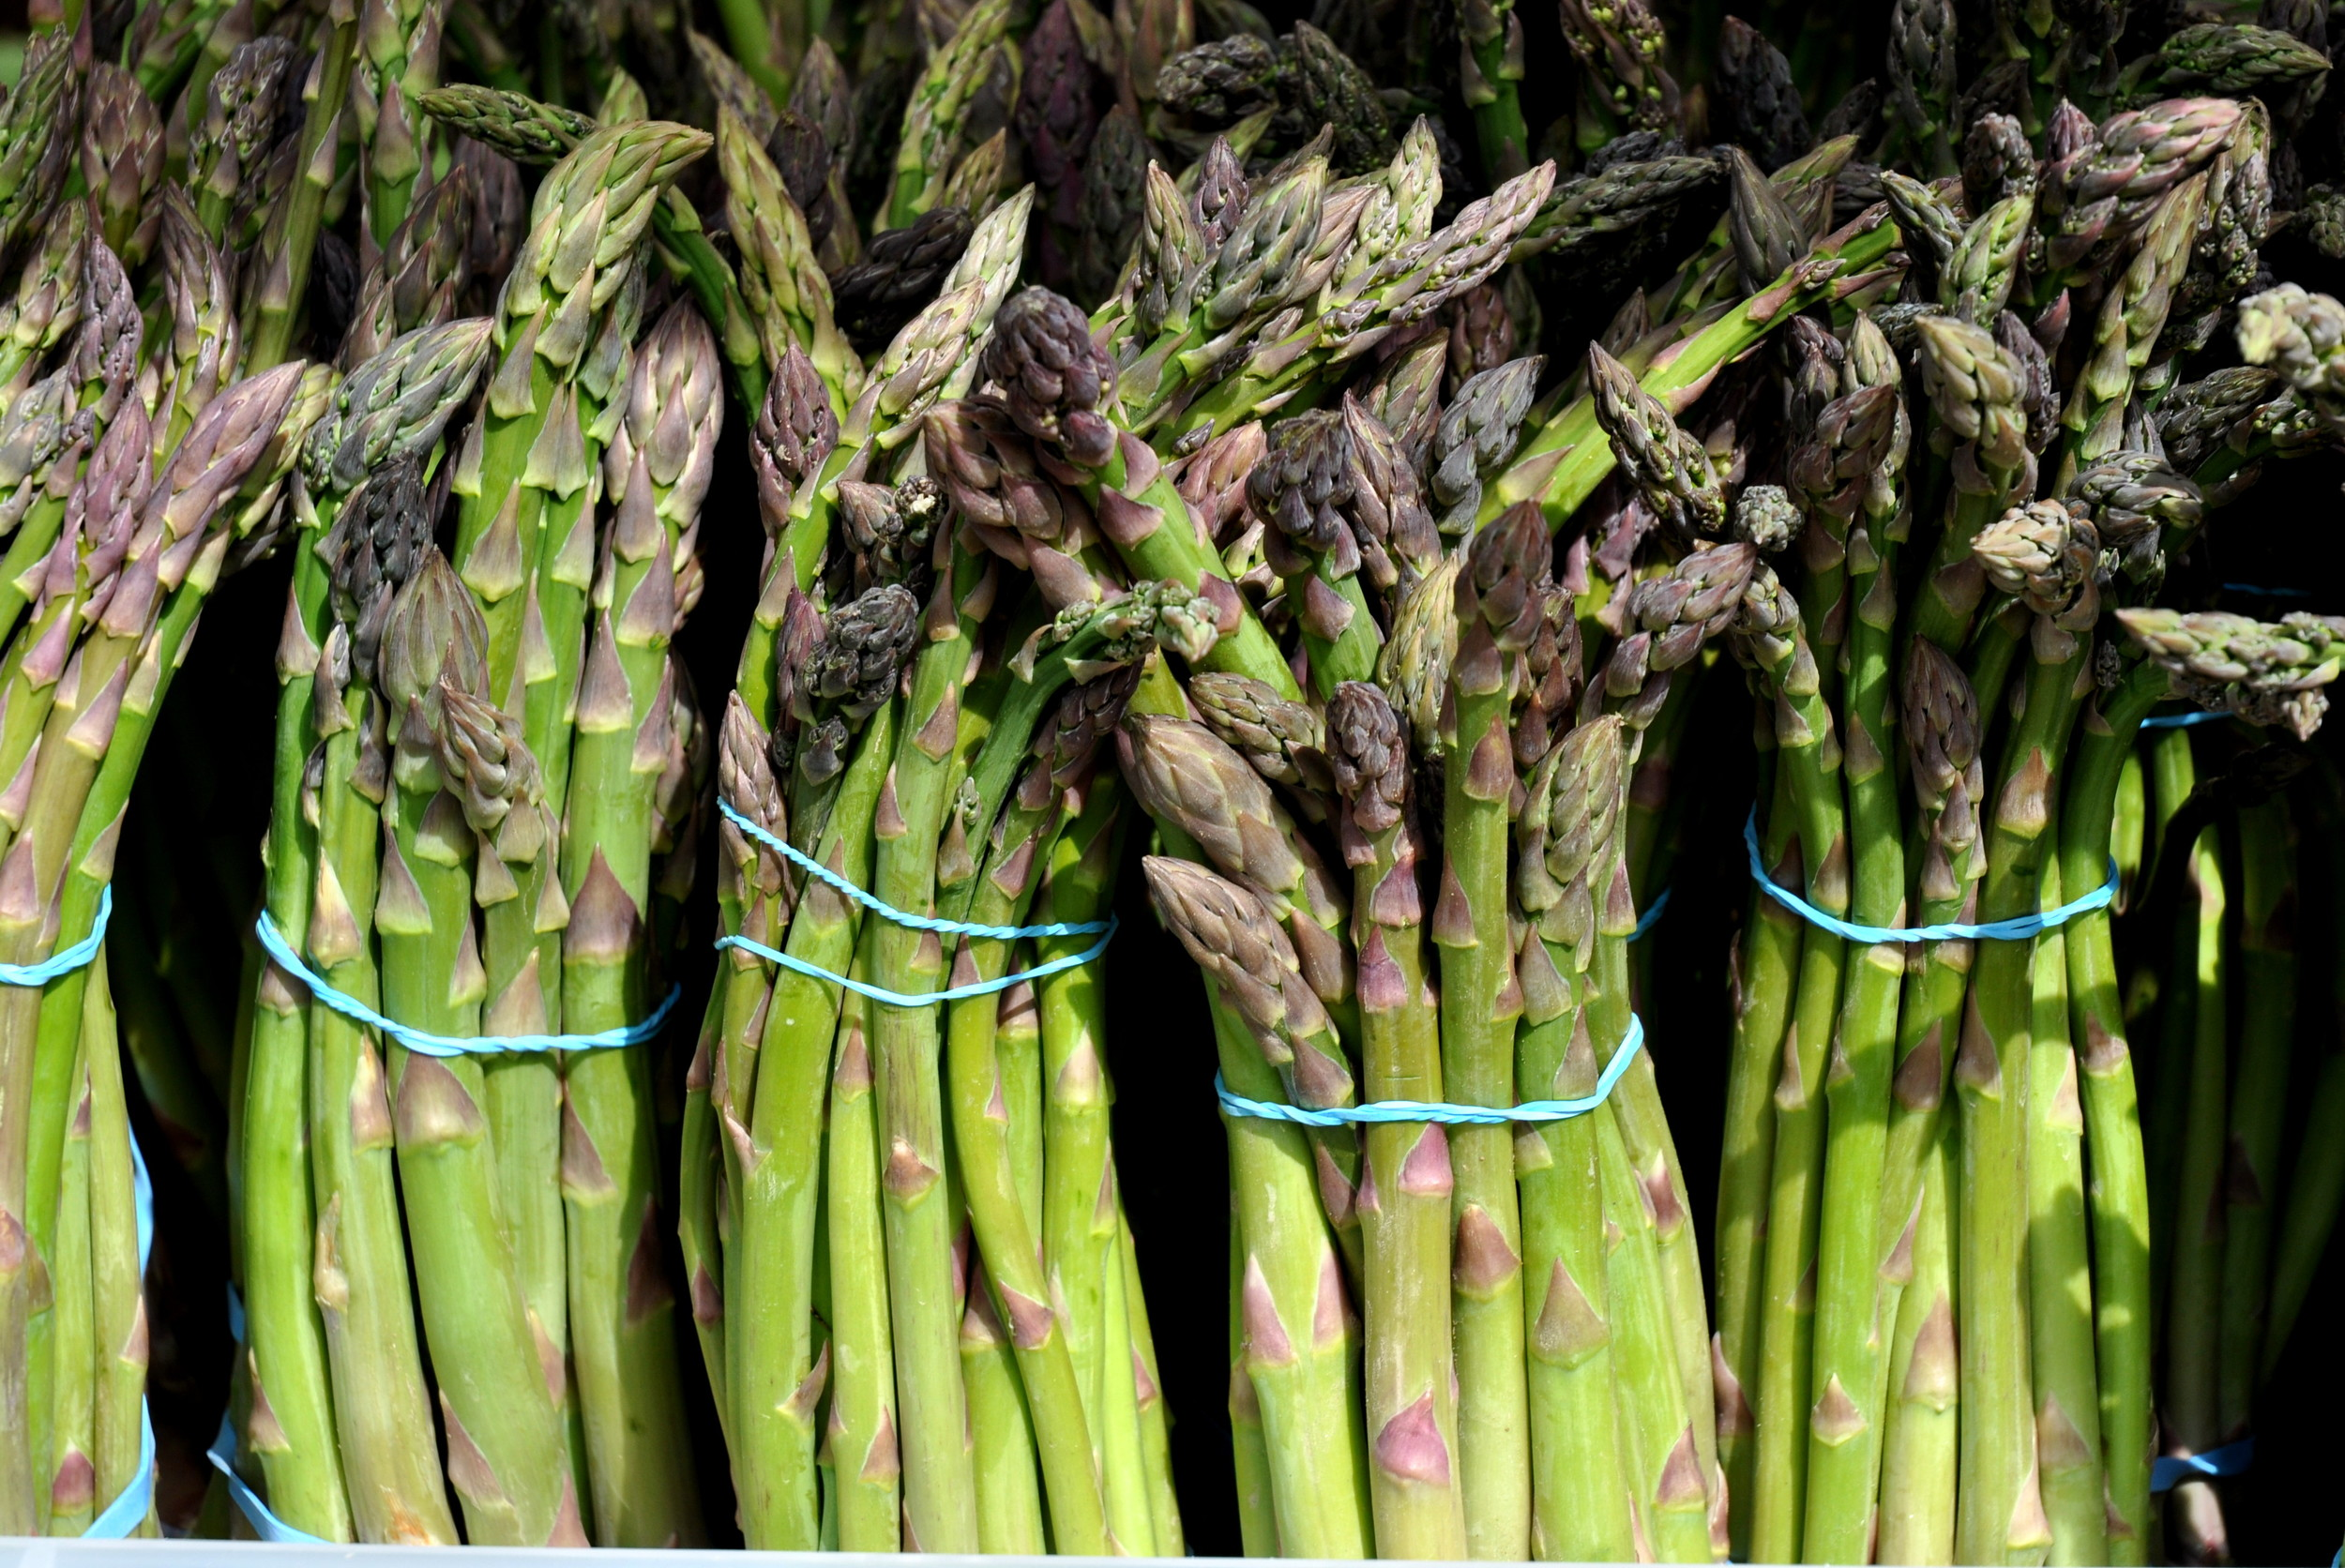 Organic asparagus from Alvarez Organic Farms. Photo copyright 2014 by Zachary D, Lyons.